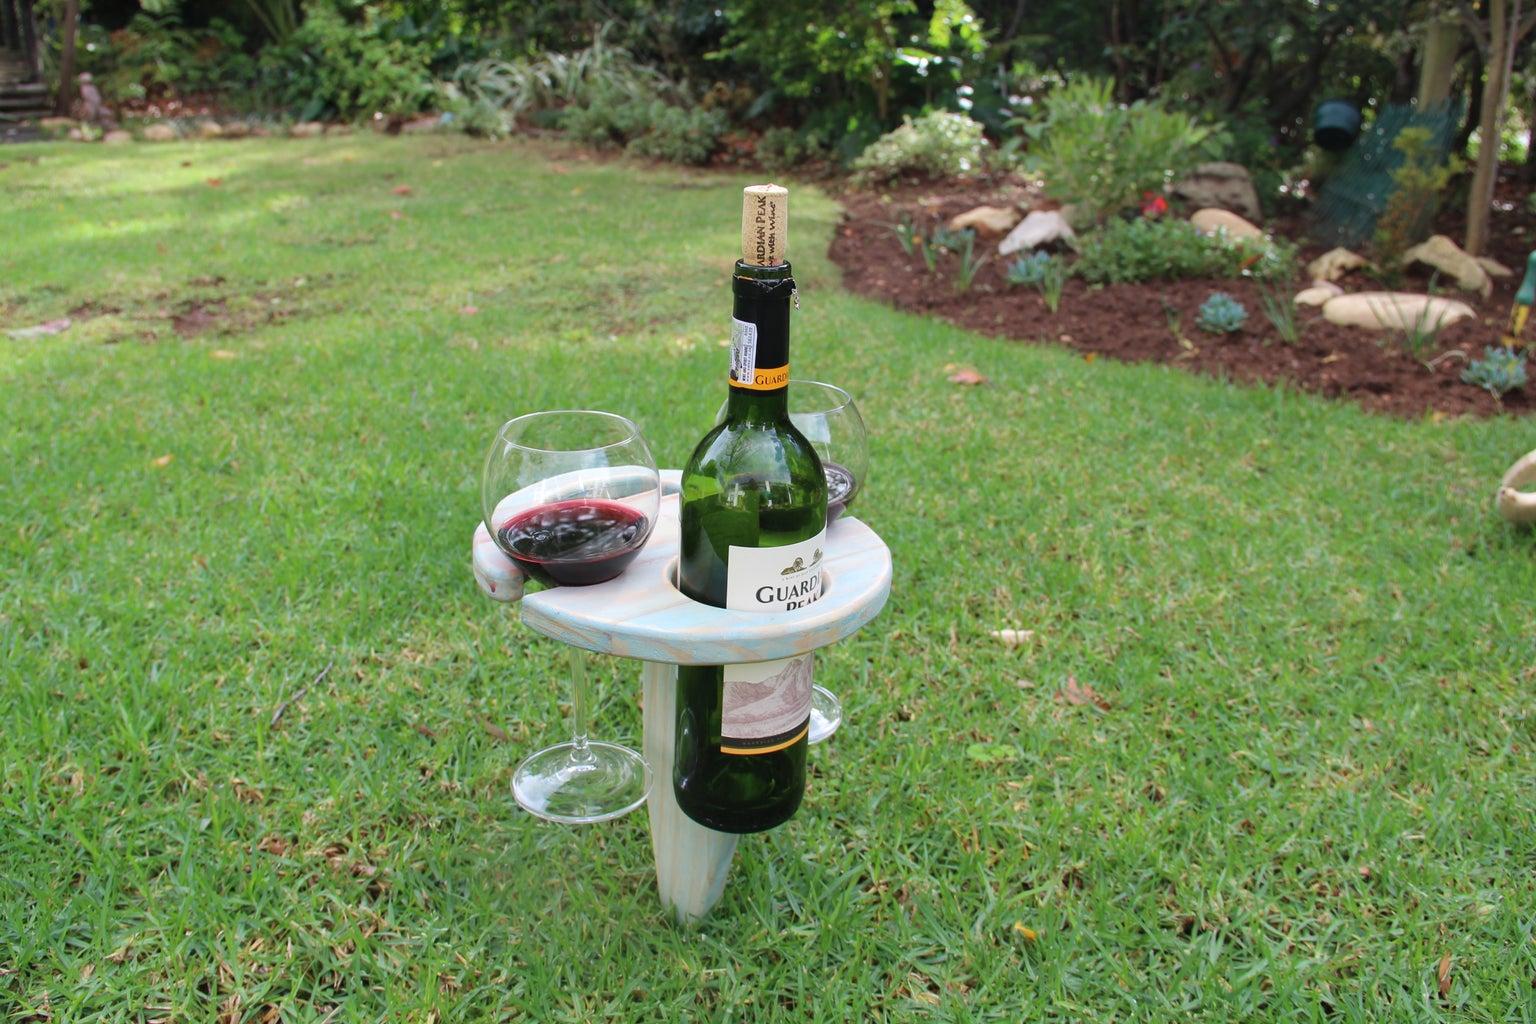 Enjoy Your New Wine Holder.